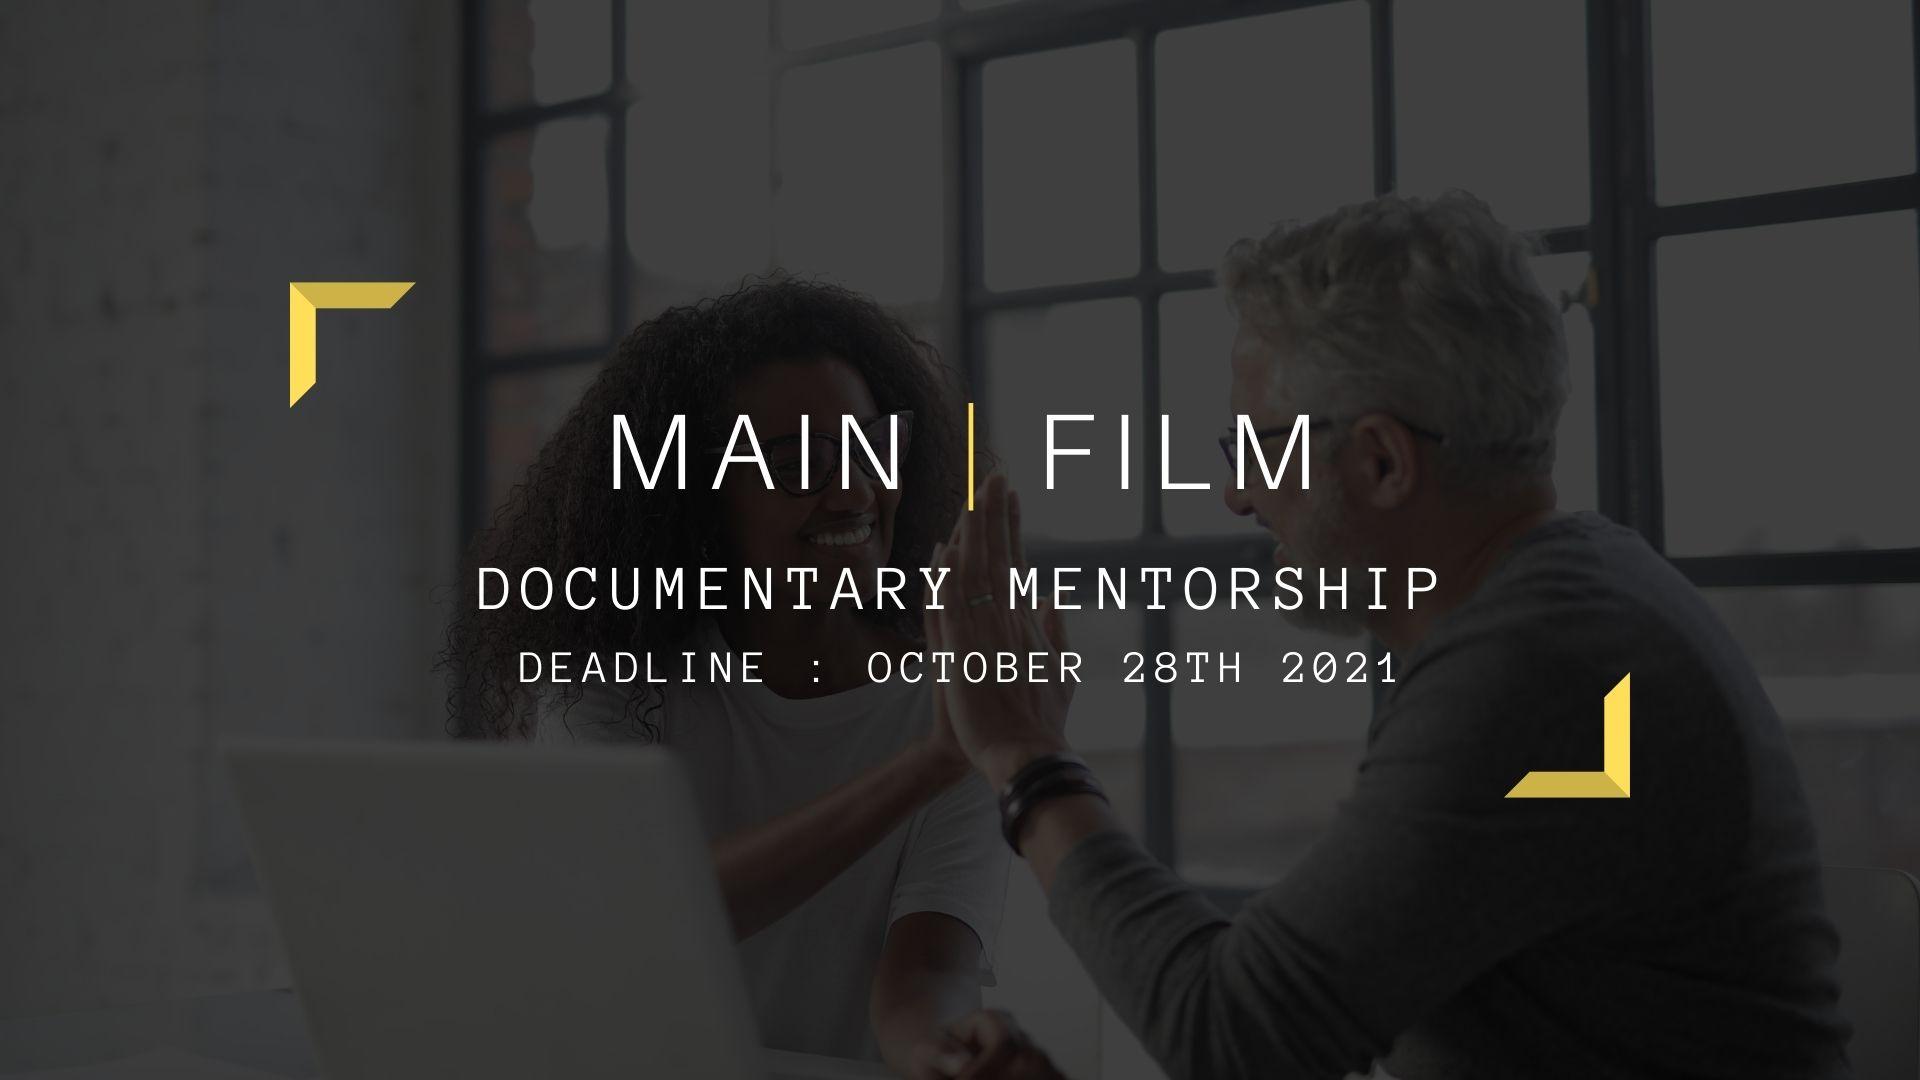 Mentorship application for Documentary Filmmakers   Online